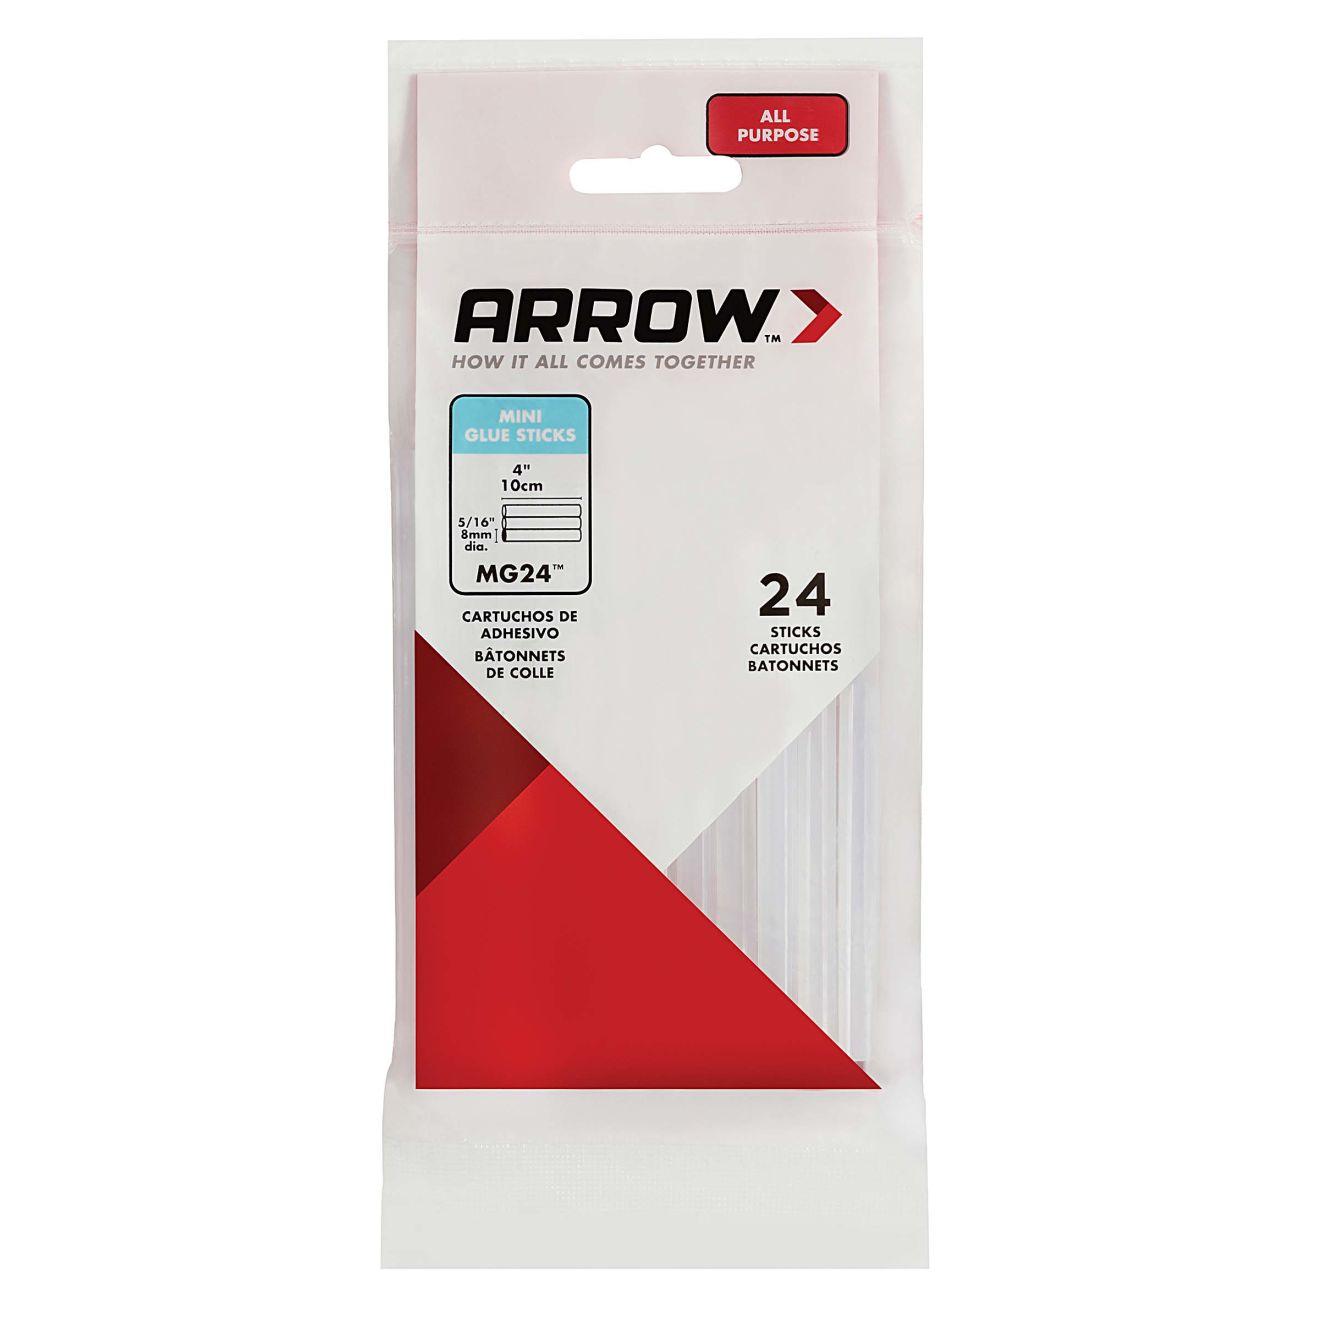 Arrow 2 oz. All-Purpose Clear Mini Glue Sticks (24-Pack)